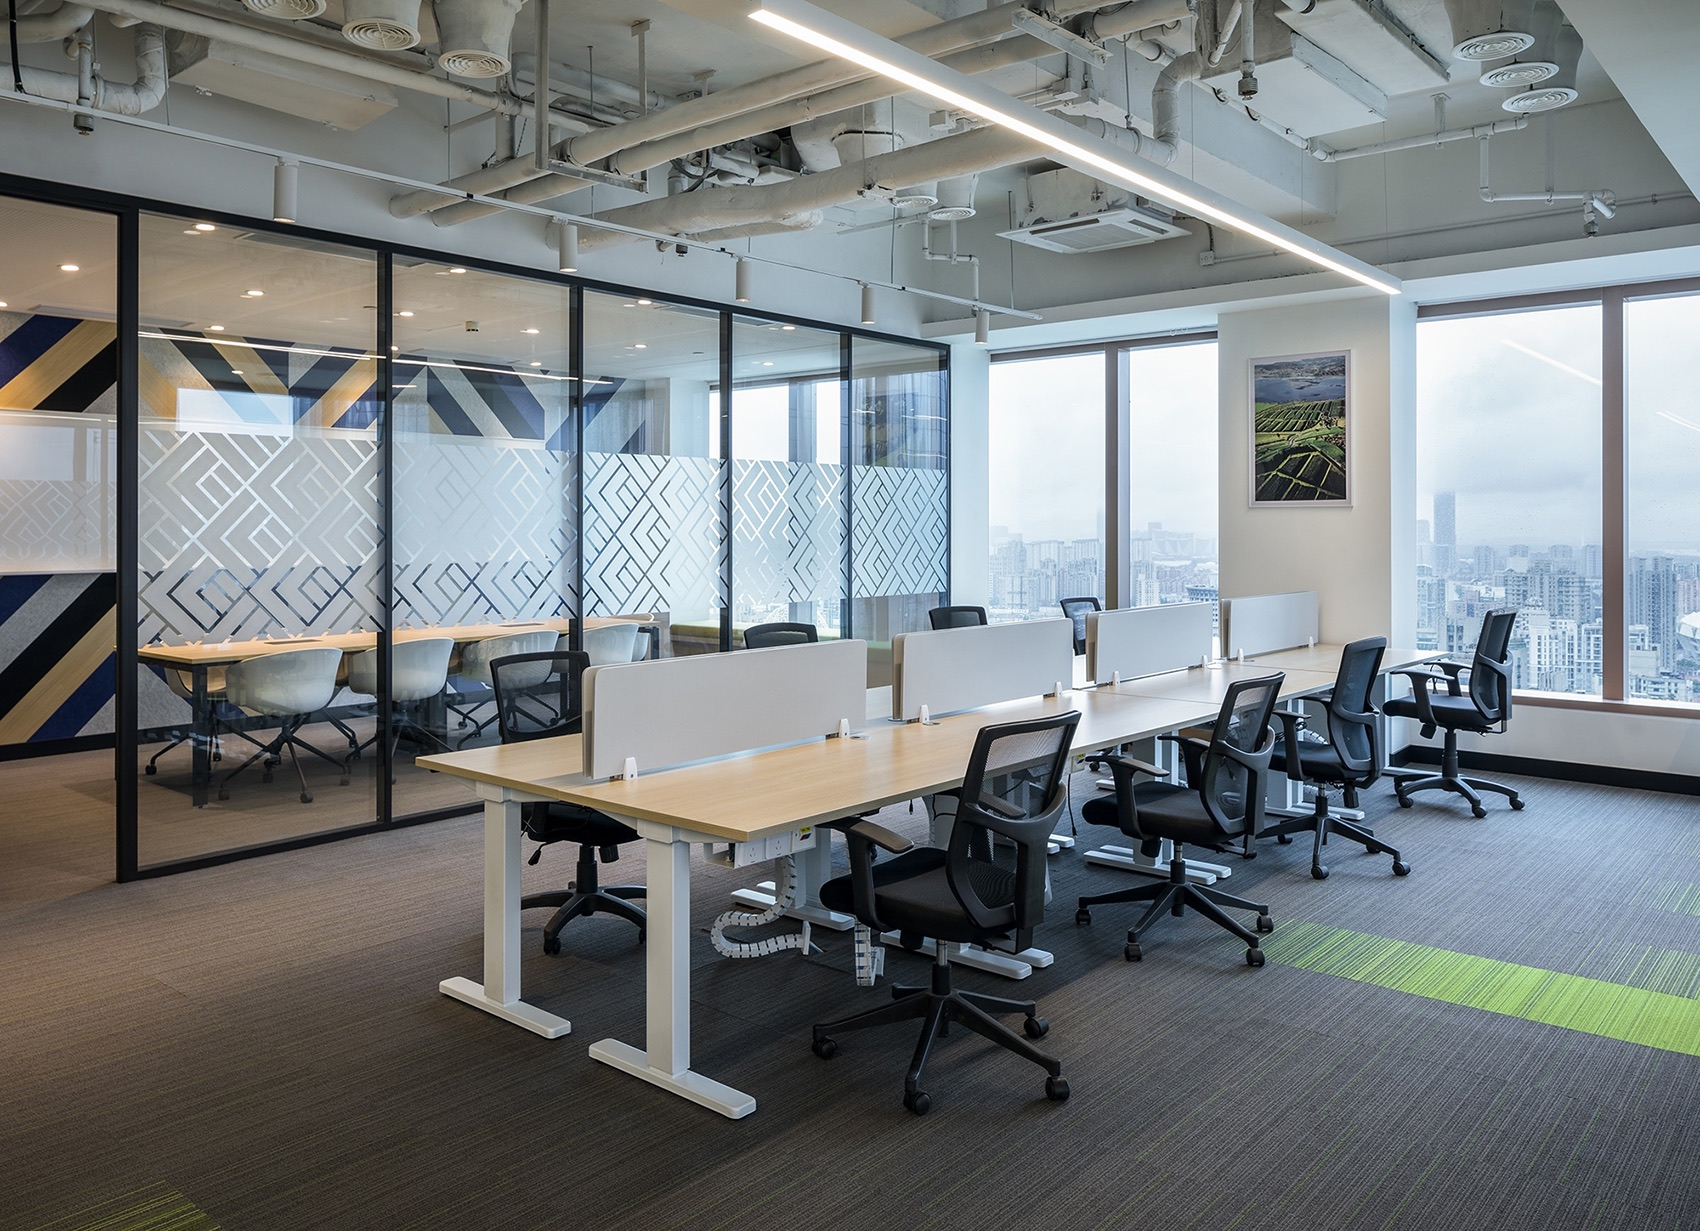 zespri-image-shanghai-office-9